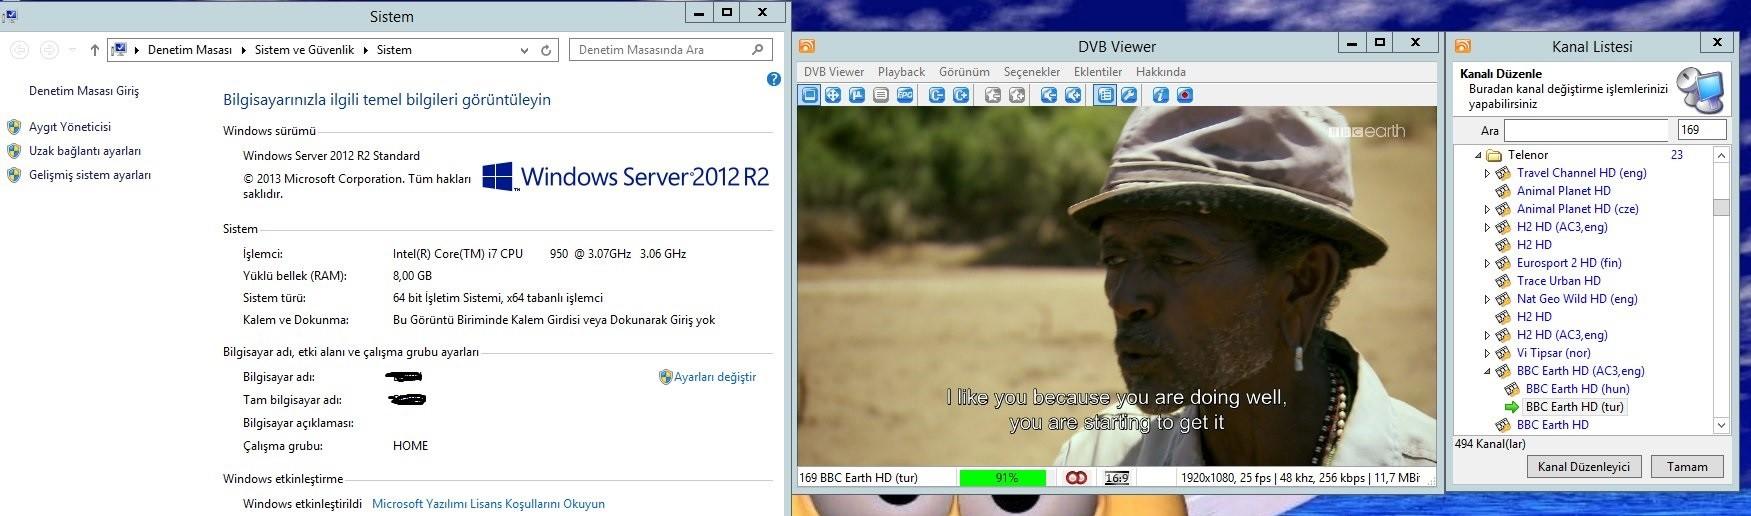 Server 2012Dvb Vivxer